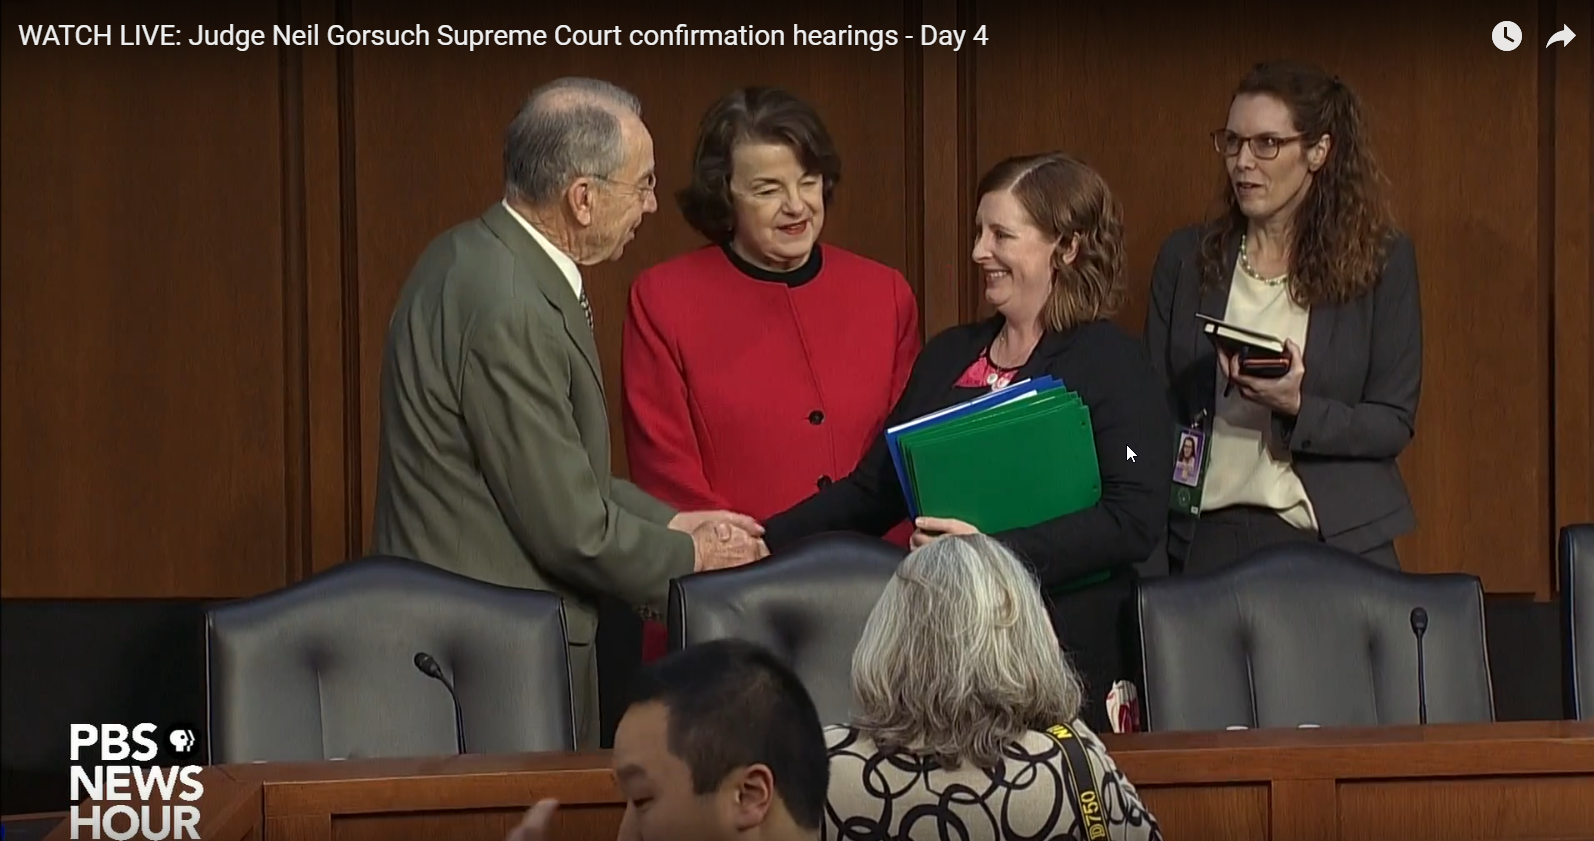 Meeting Senator Feinstein and Senator Grassley. Photo from PBS NewsHour